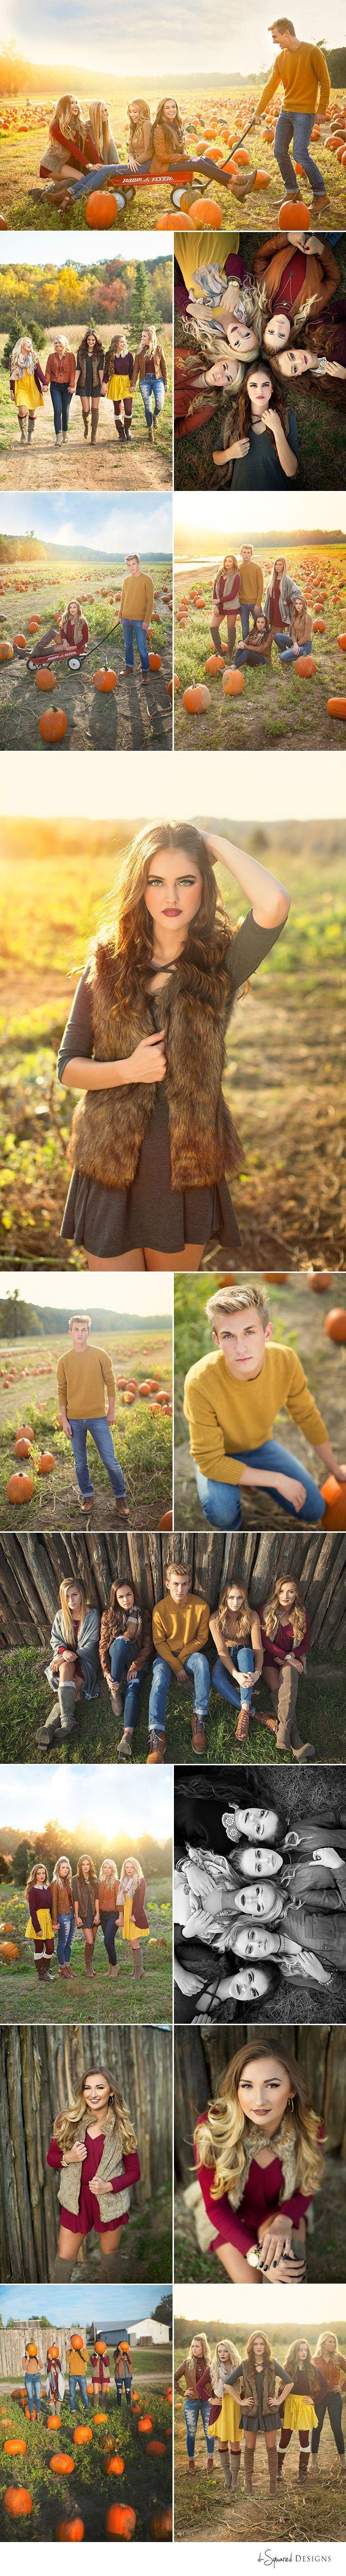 d-Squared Designs St. Louis, MO Senior Photography. Senior model team. Senior model inspiration. Fall shoot. Pumpkin patch. Senior pumpkin inspiration. Girl posing. Group posing. Red flyer wagon idea.